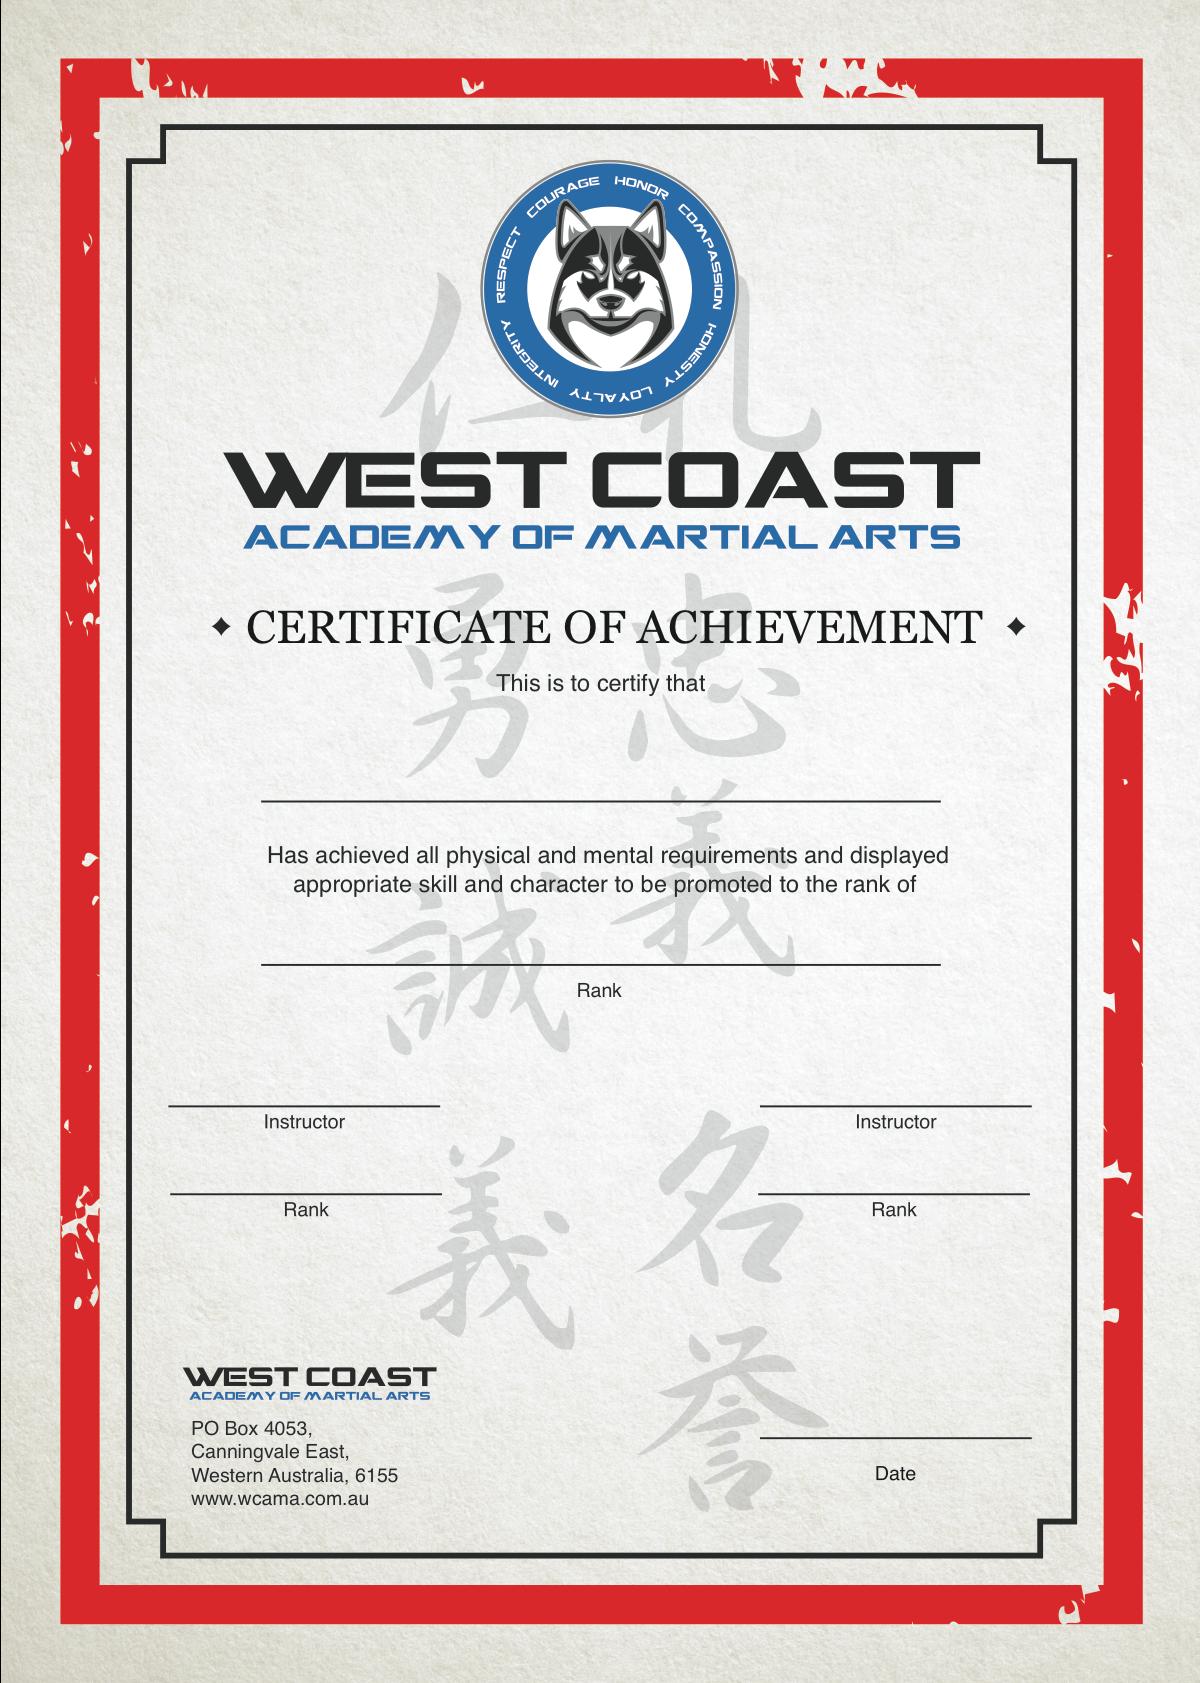 WCAMA Certificate design